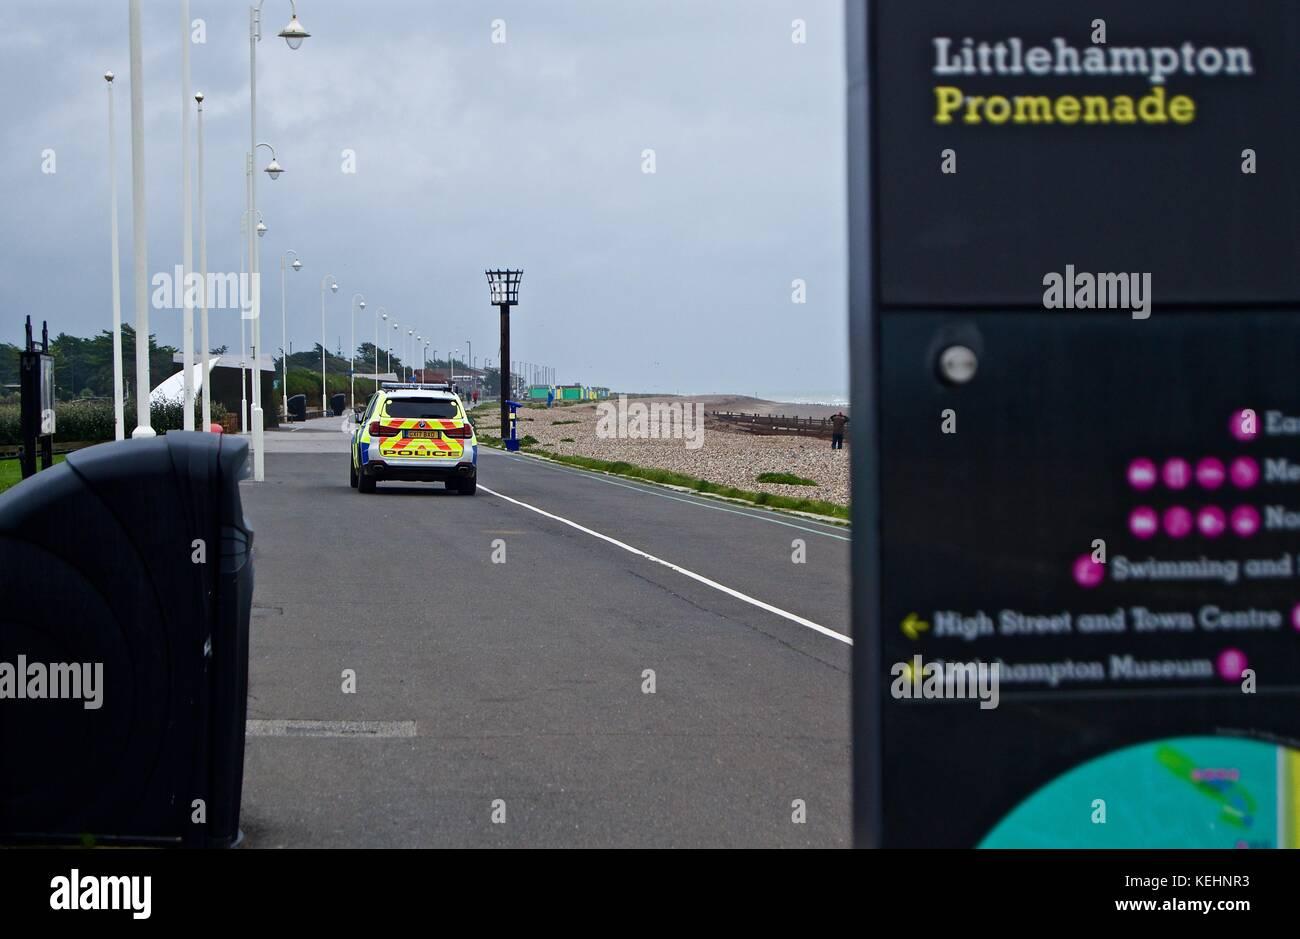 Police car on promenade, Littlehampton, UK - Stock Image